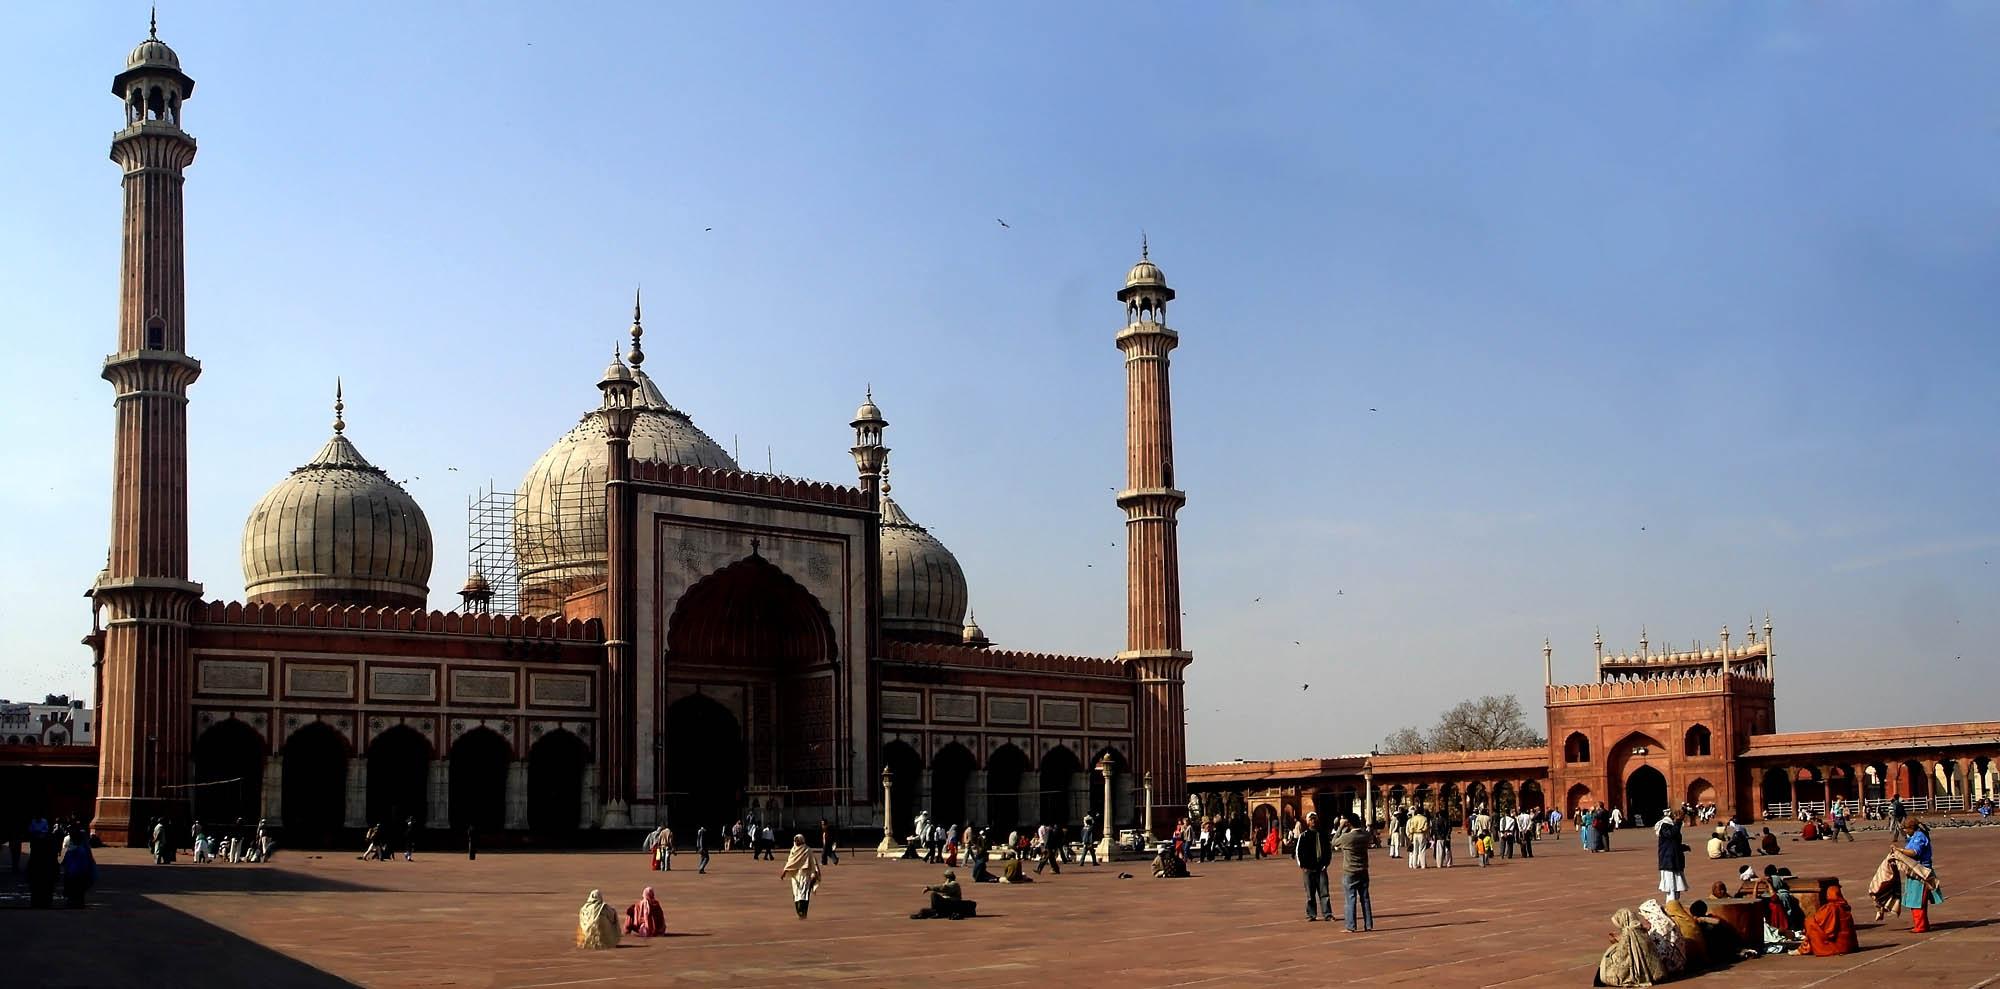 Segalanya Disini Koleksi Gambar Masjid Seluruh Dunia